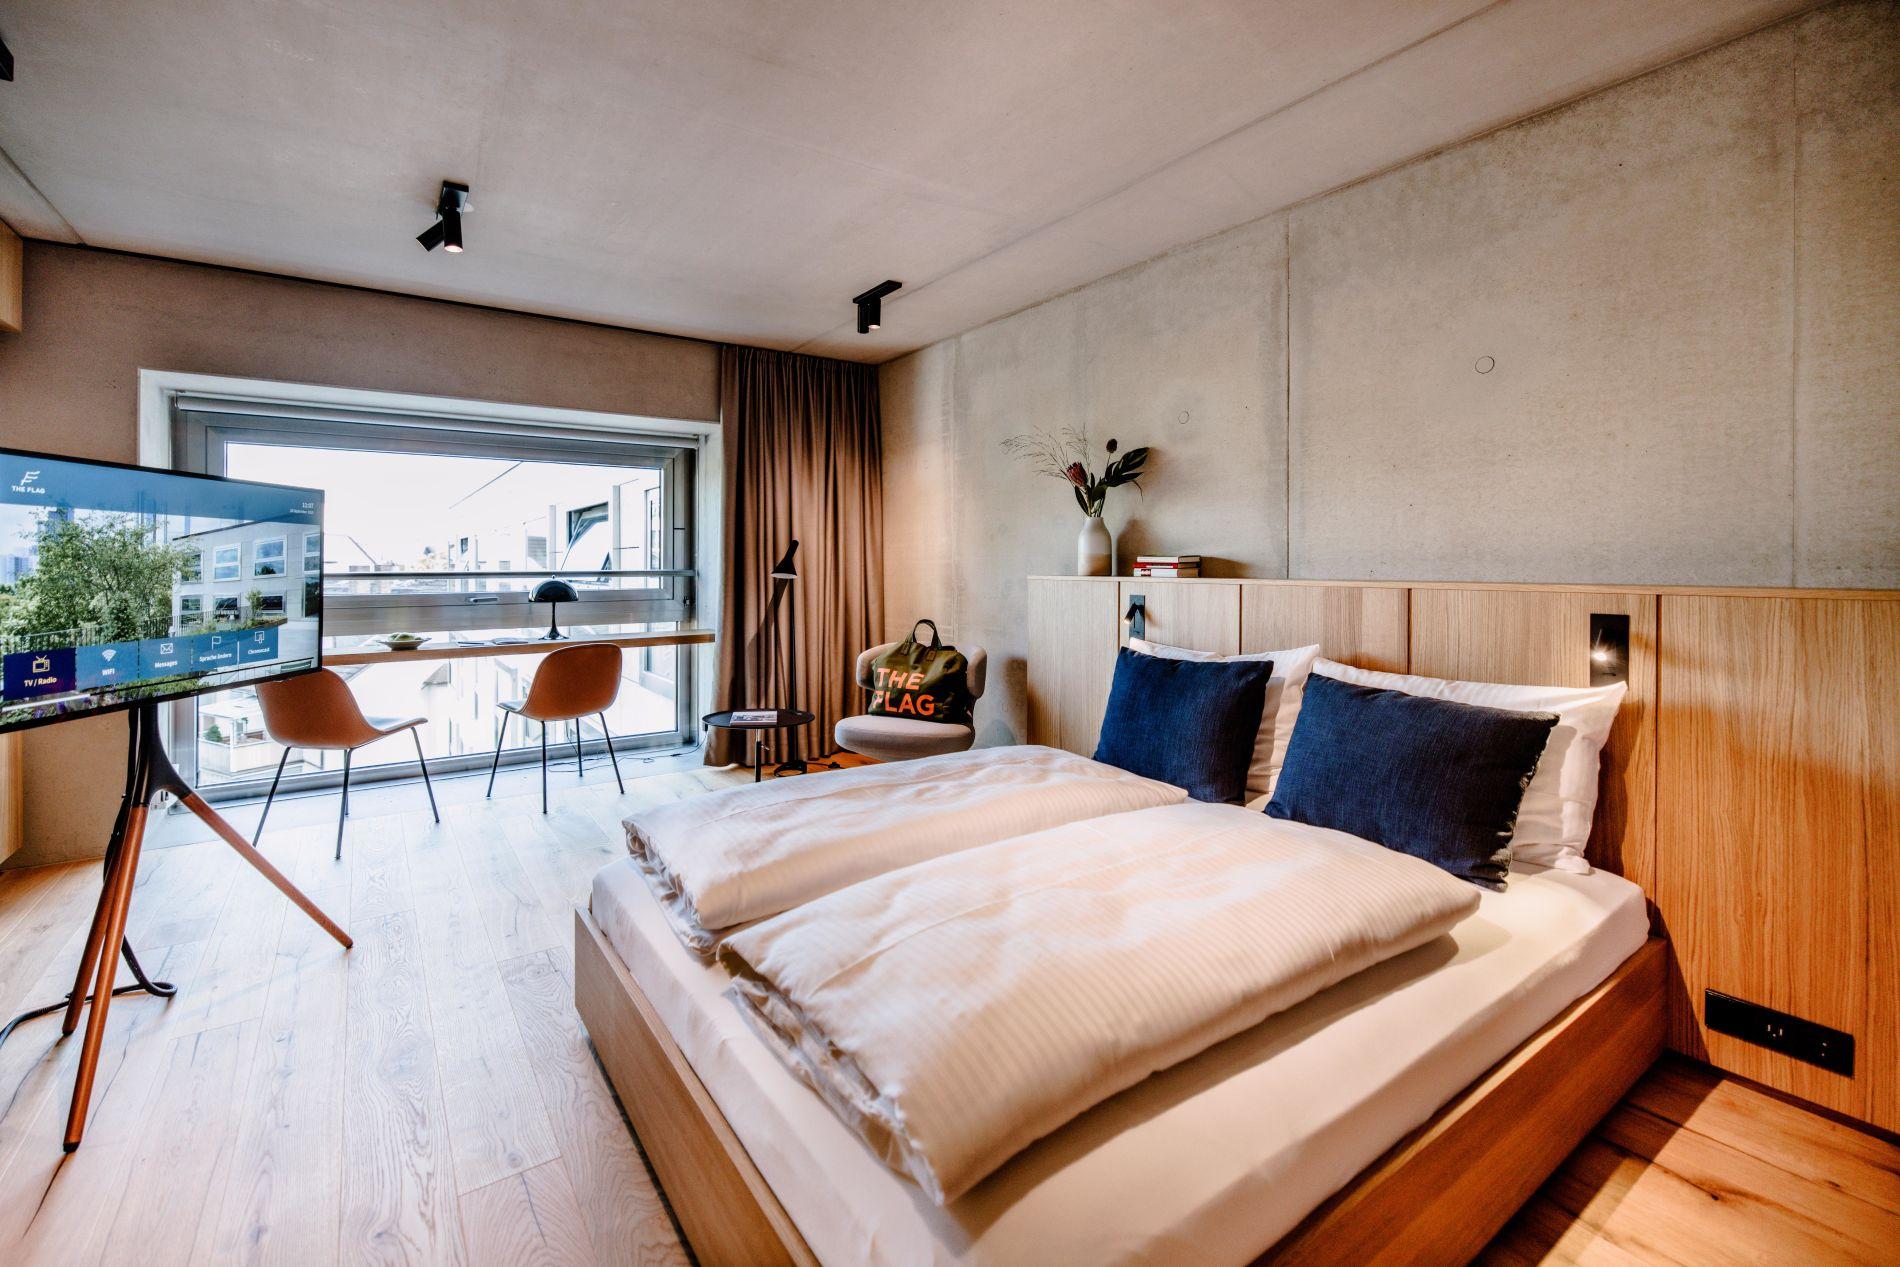 Serviced studio apartment in Frankfurt that allows pets